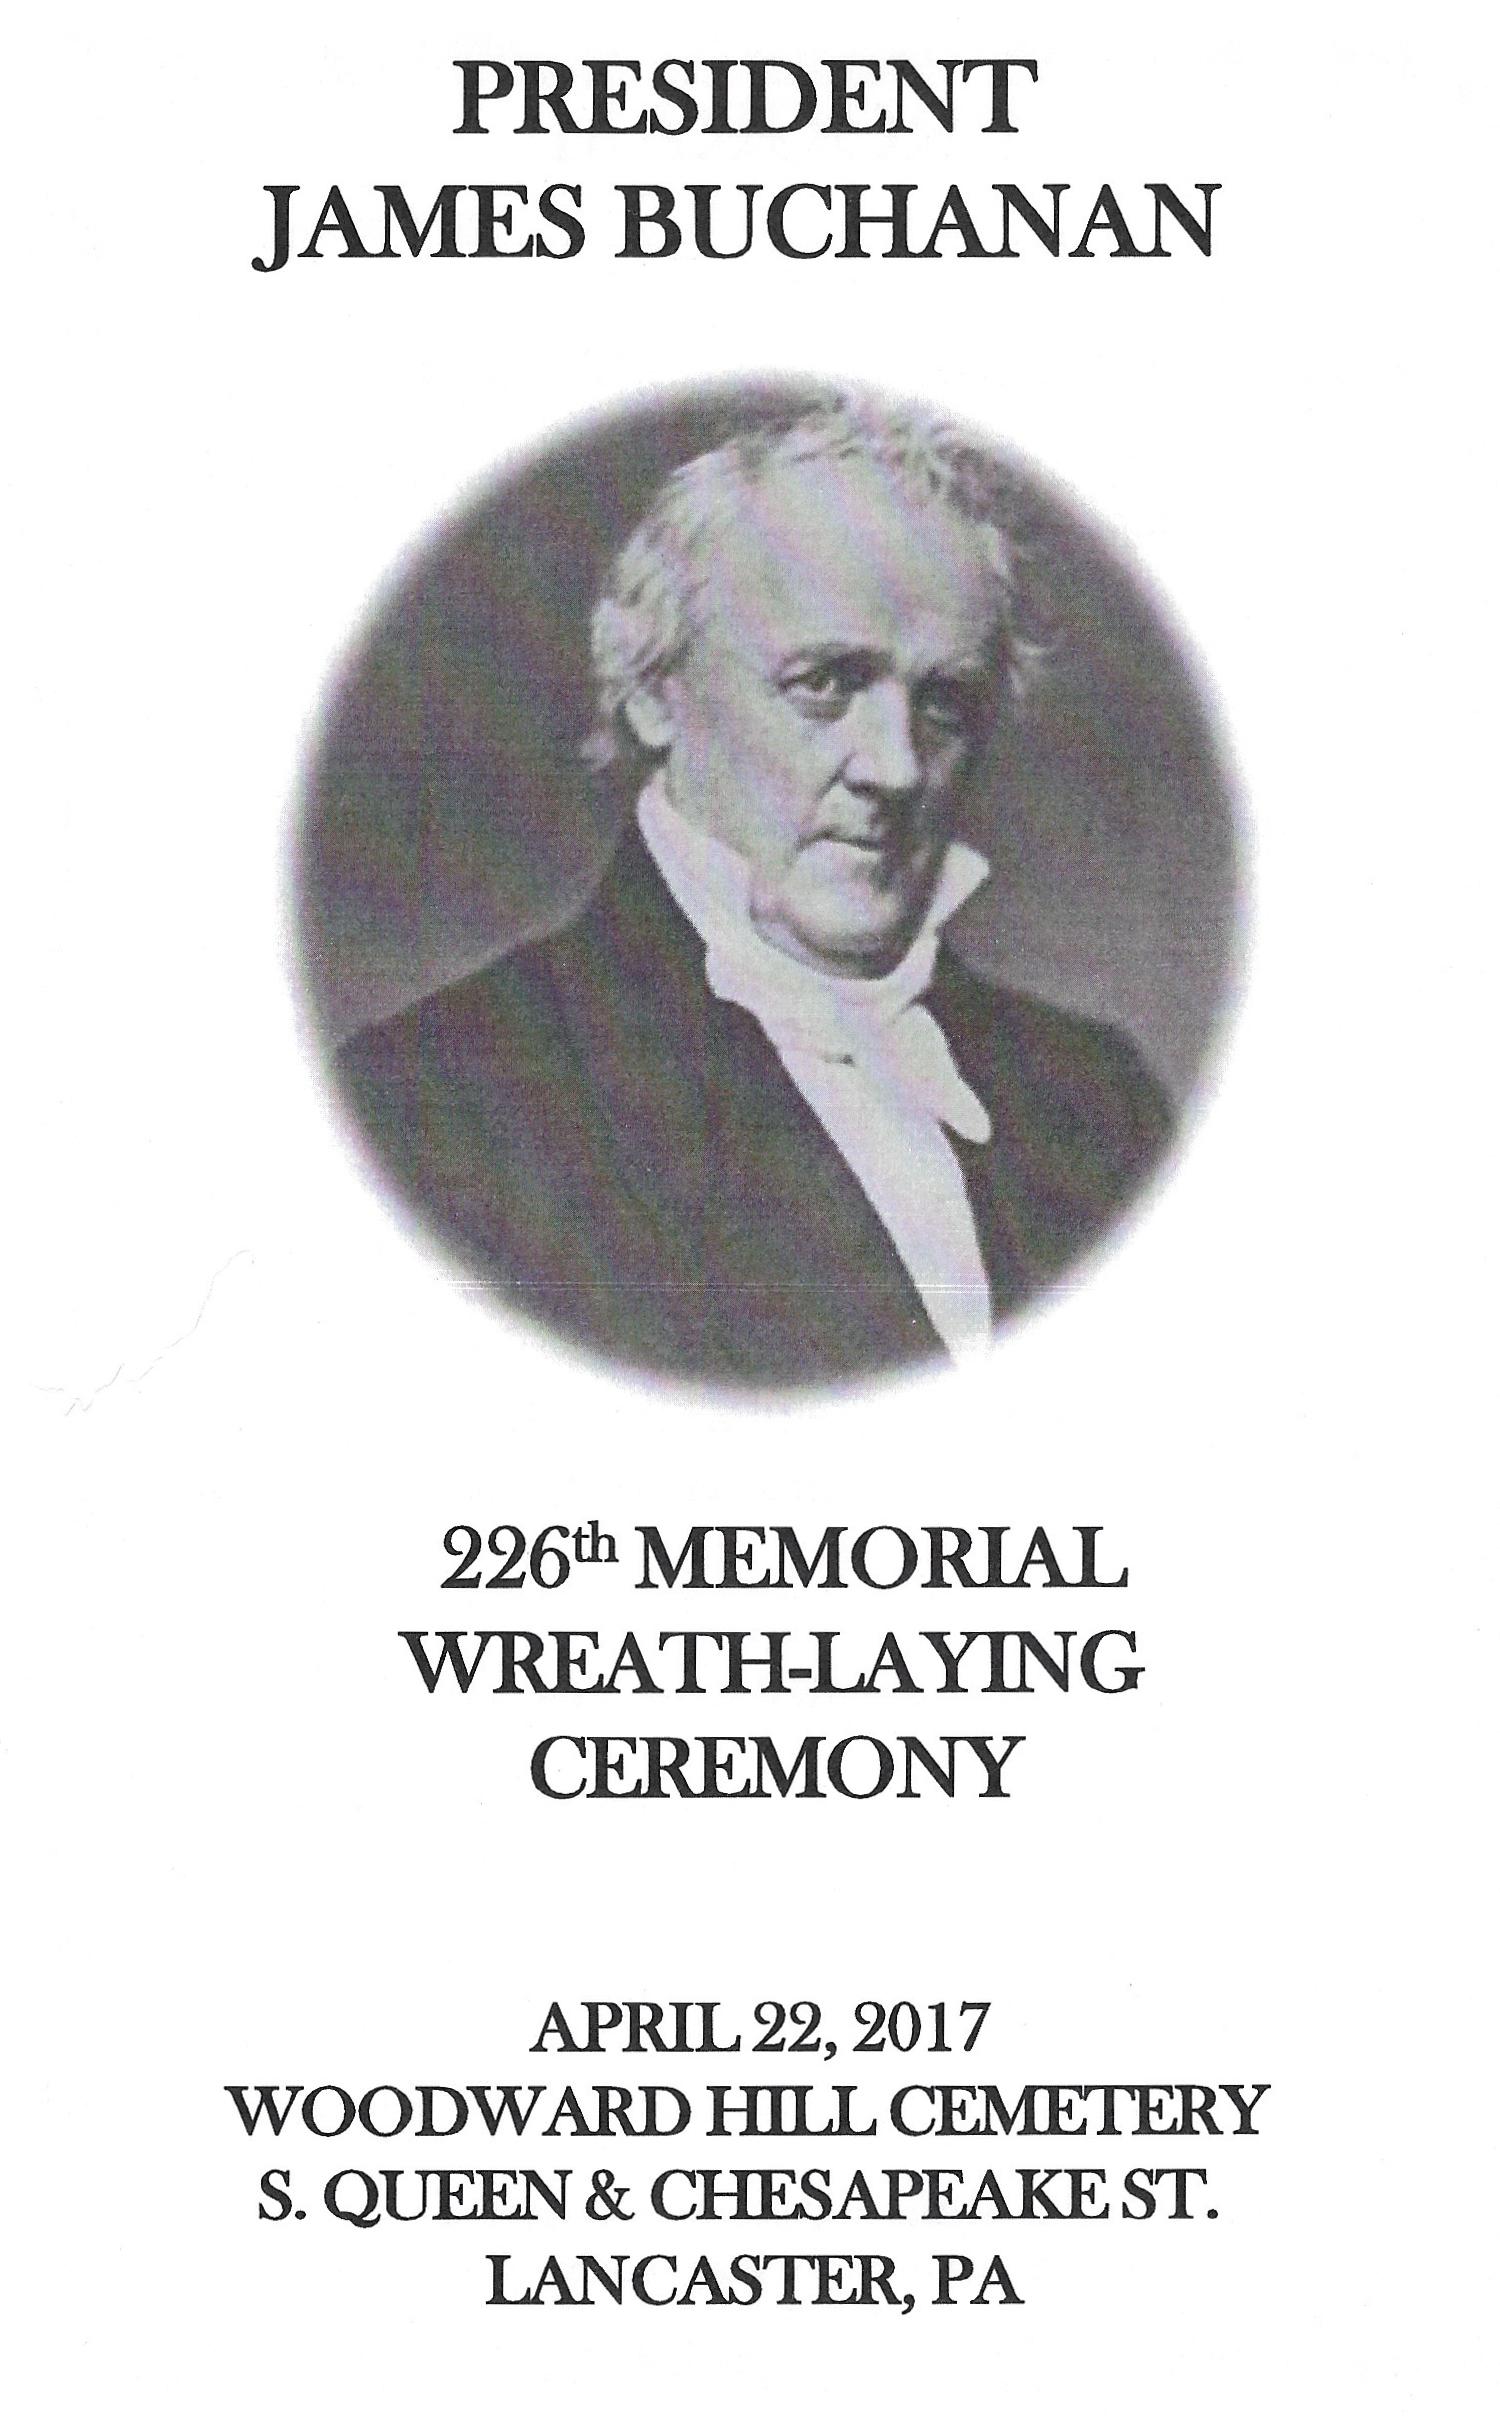 170422 Buchanan wreath laying ceremony program cover page.jpg